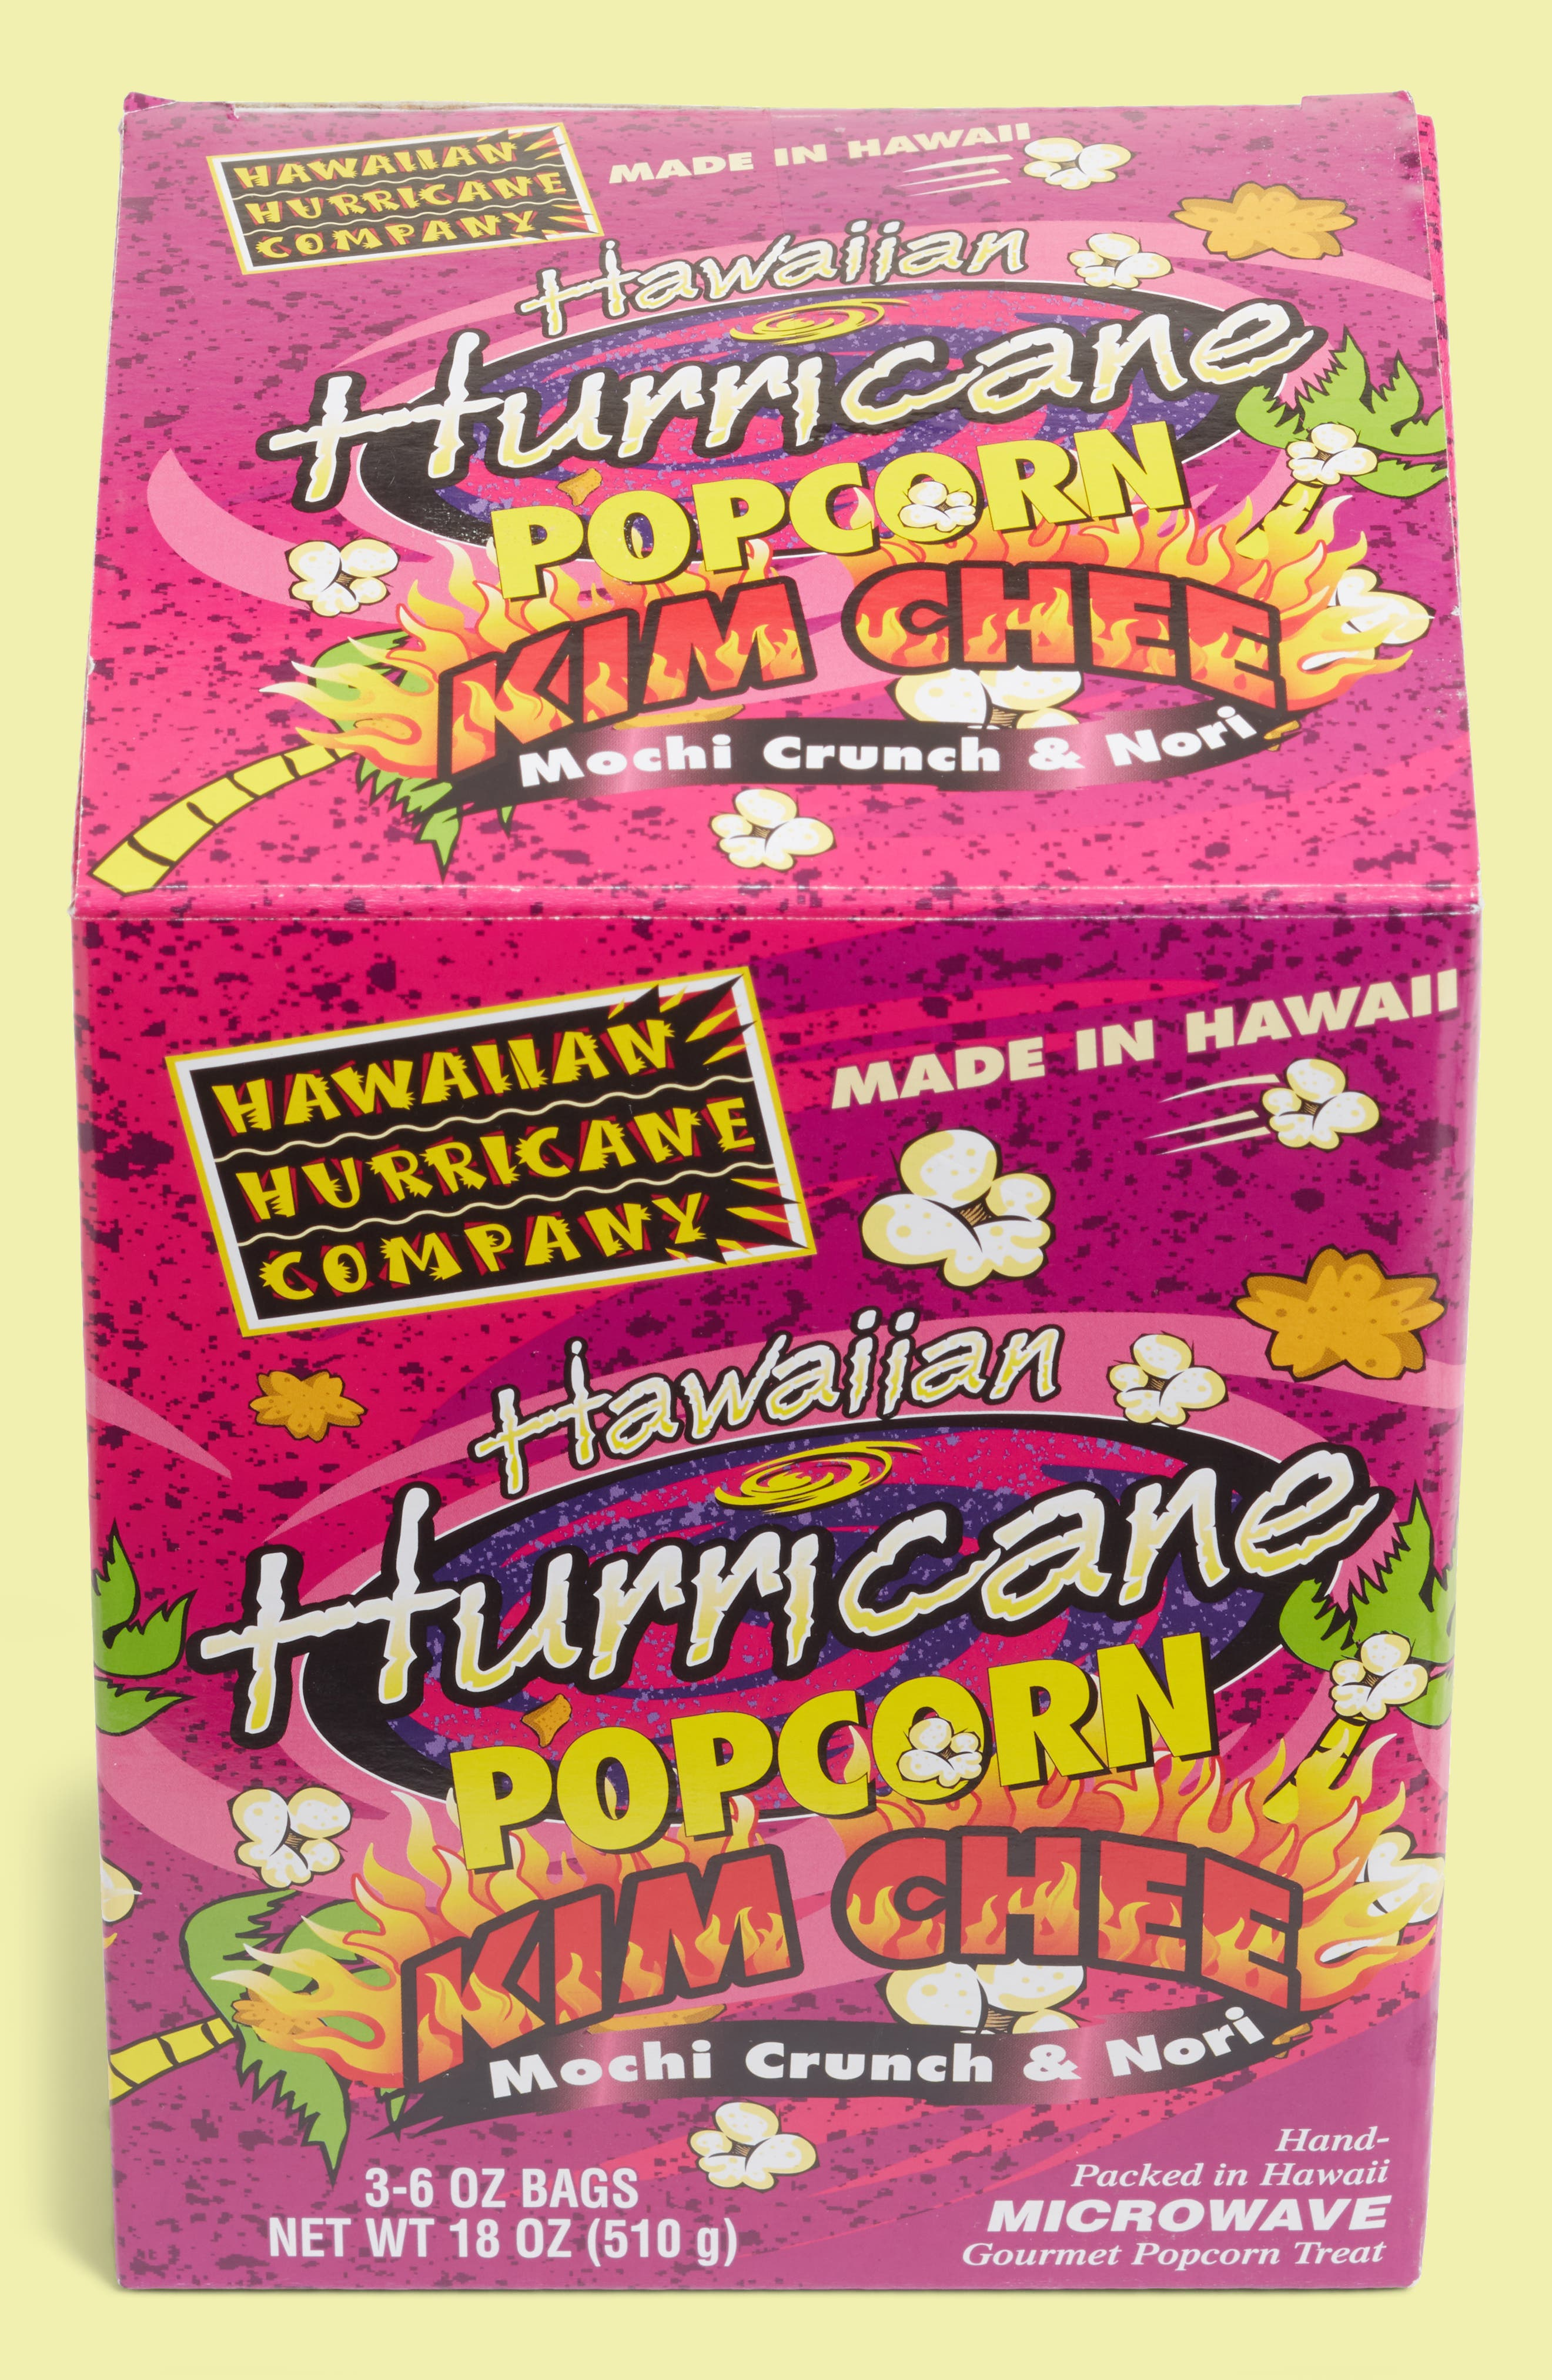 Hawaiian Hurricane Kim Chee Mochi Crunch & Nori 3 Pack Gourmet Microwave Popcorn by Hurricane Popcorn